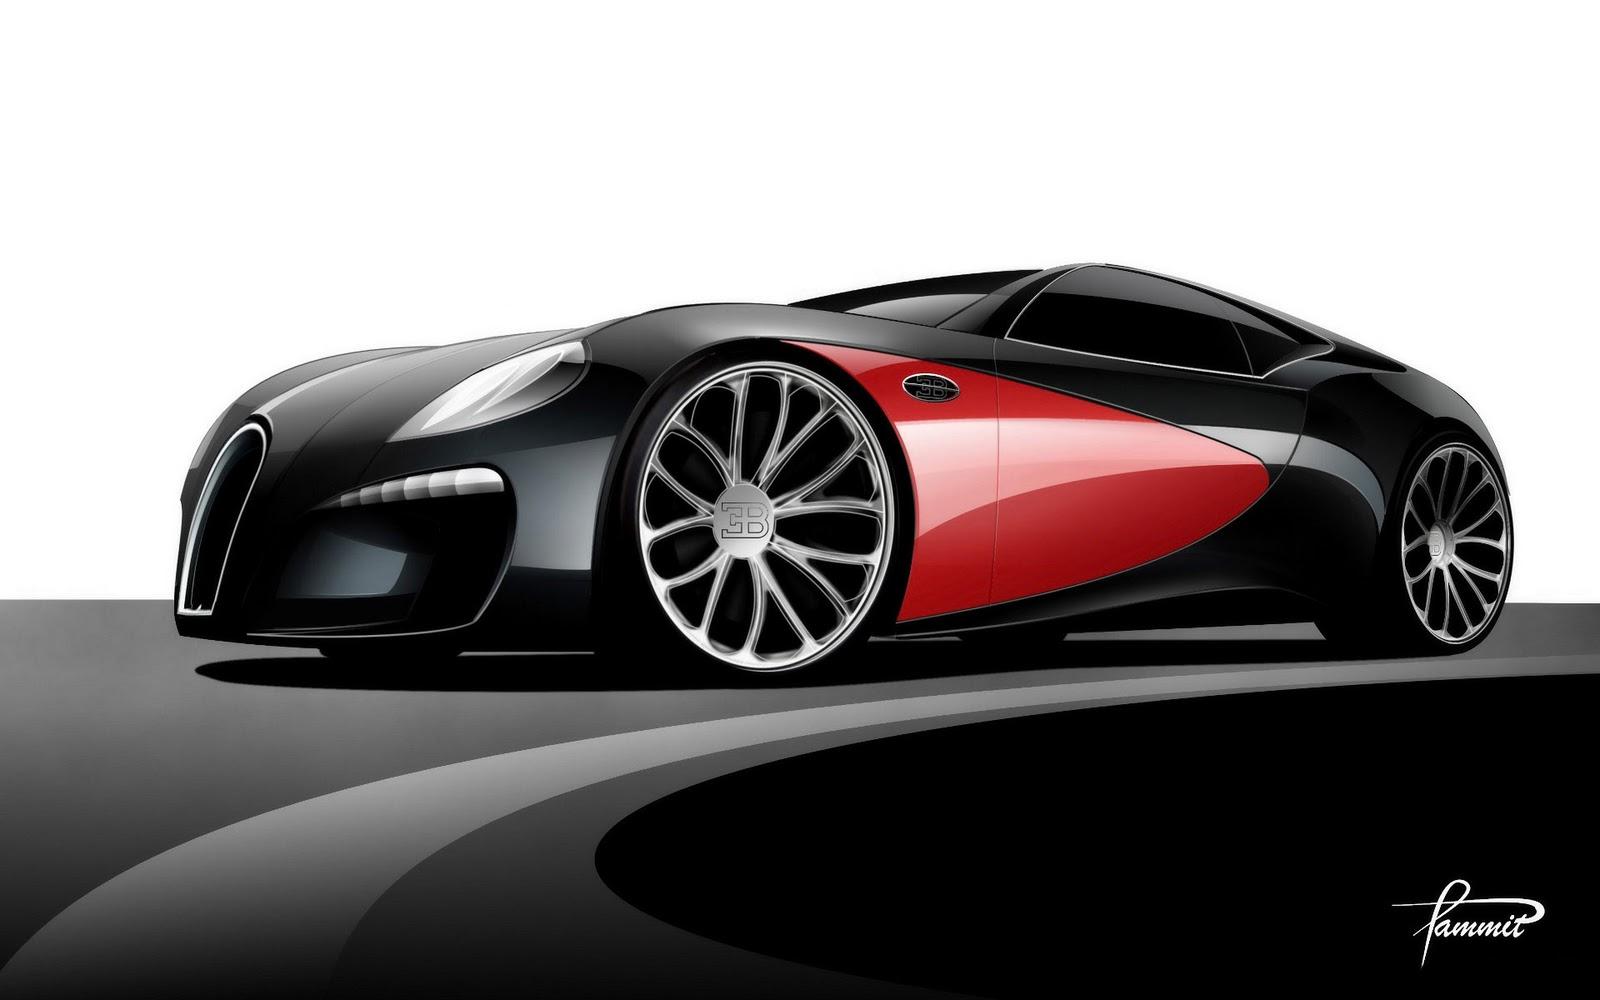 car pic wallpaper,land vehicle,vehicle,sports car,automotive design,car